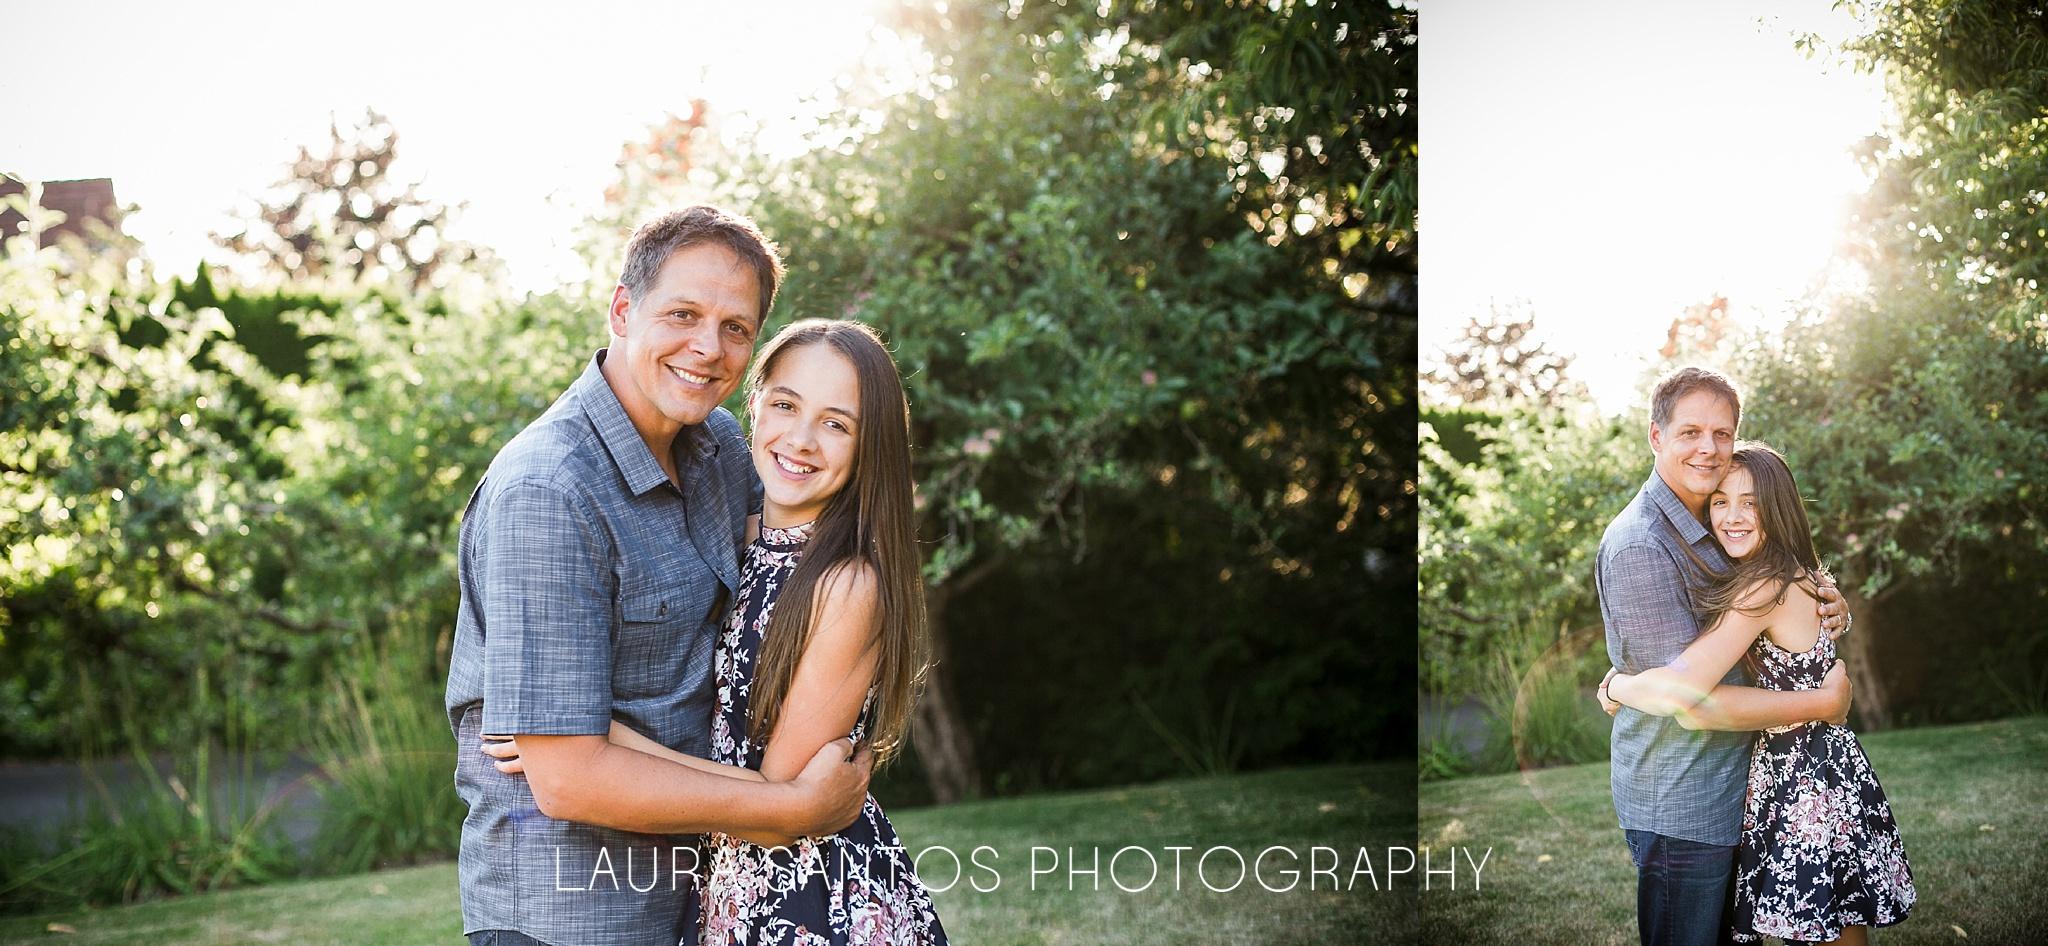 Laura Santos Photography Portland Oregon Family Photographer_0123.jpg